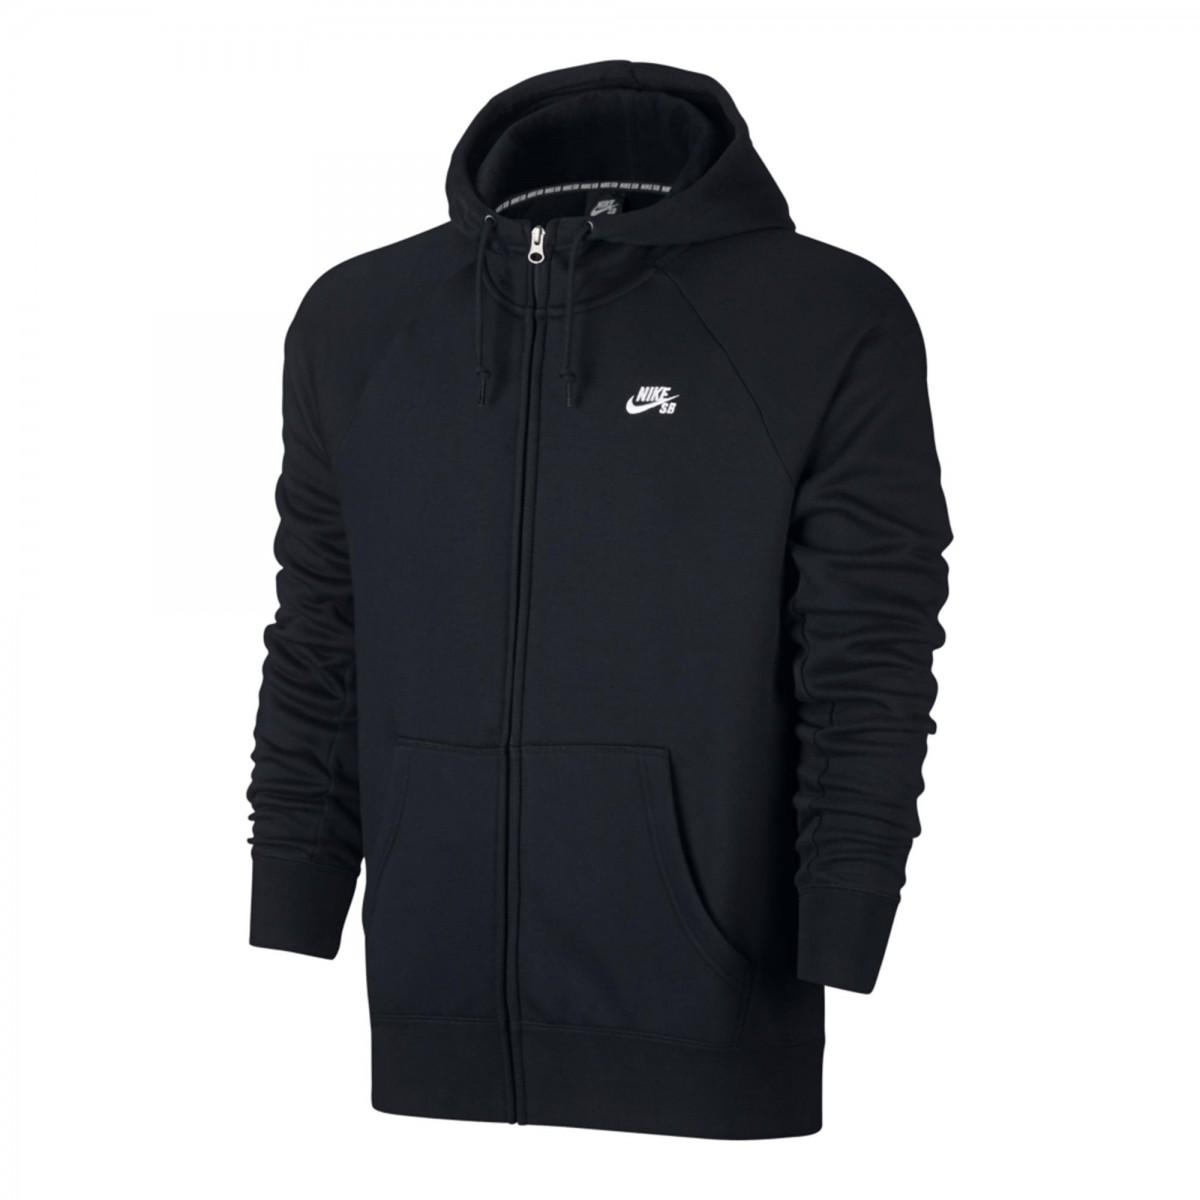 24f633e608 Bizz Store - Jaqueta Masculina Nike SB Icon FZ Hoodie Preta